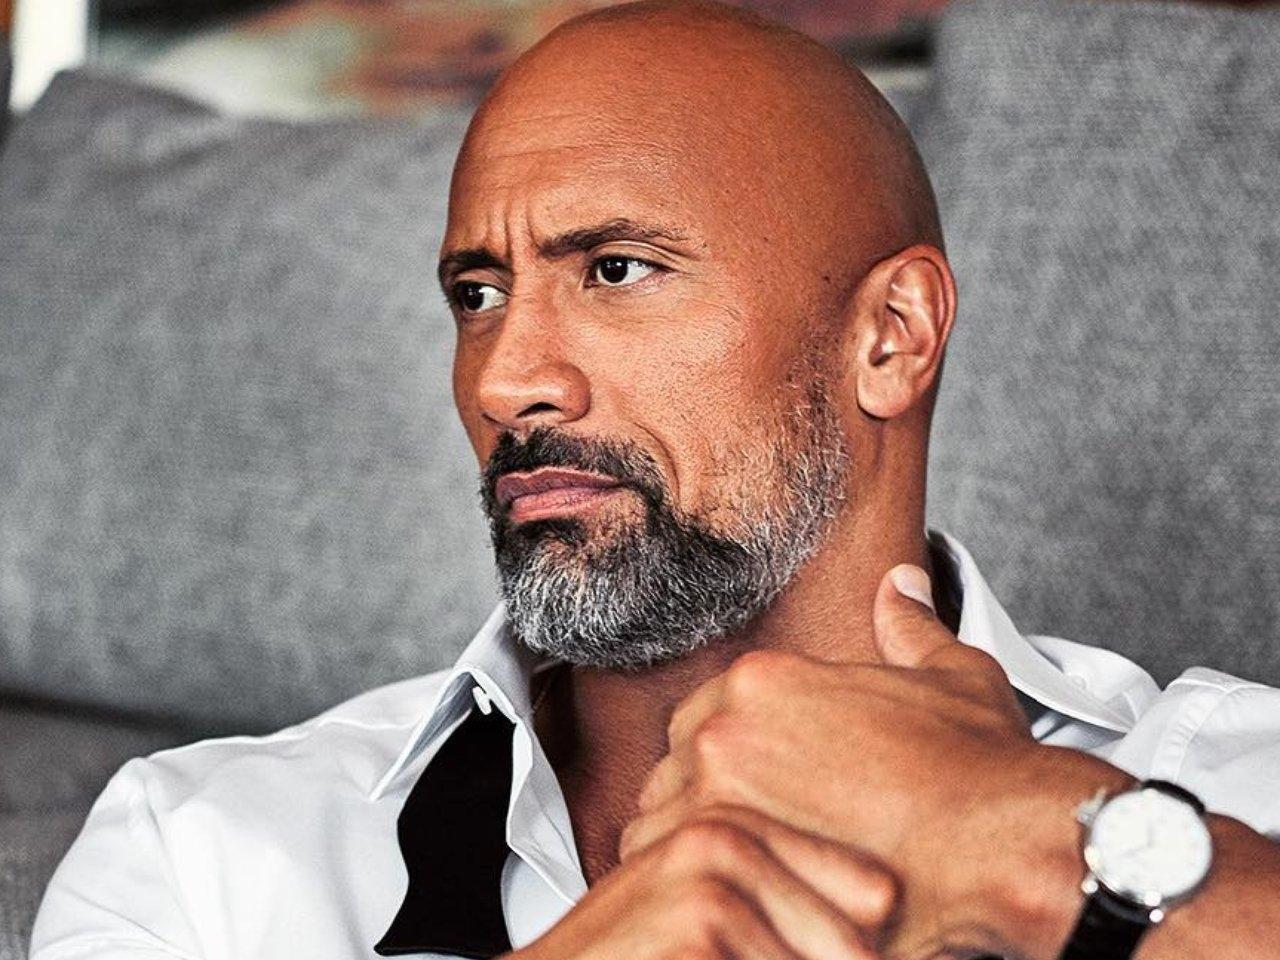 Forbes назвал самых богатых актеров 2020 года: кто же они? (ФОТО) - фото №1